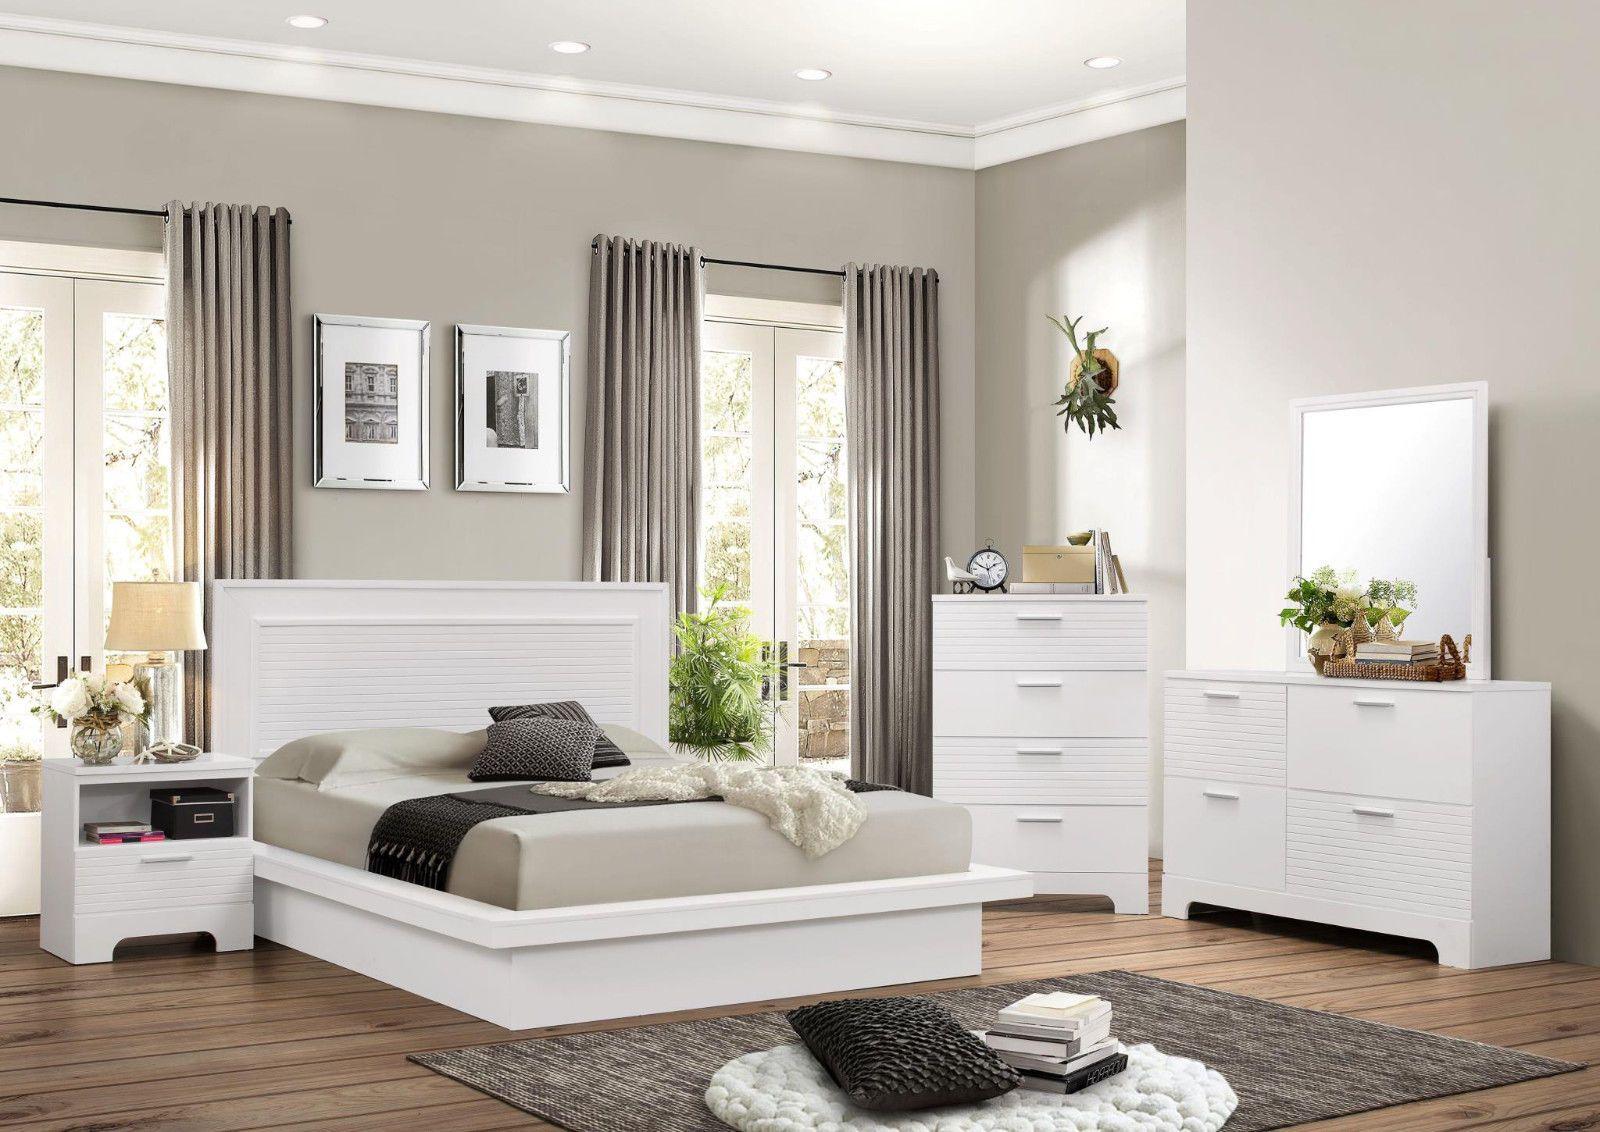 new modern rich white headboard 4pc king size bedroom set